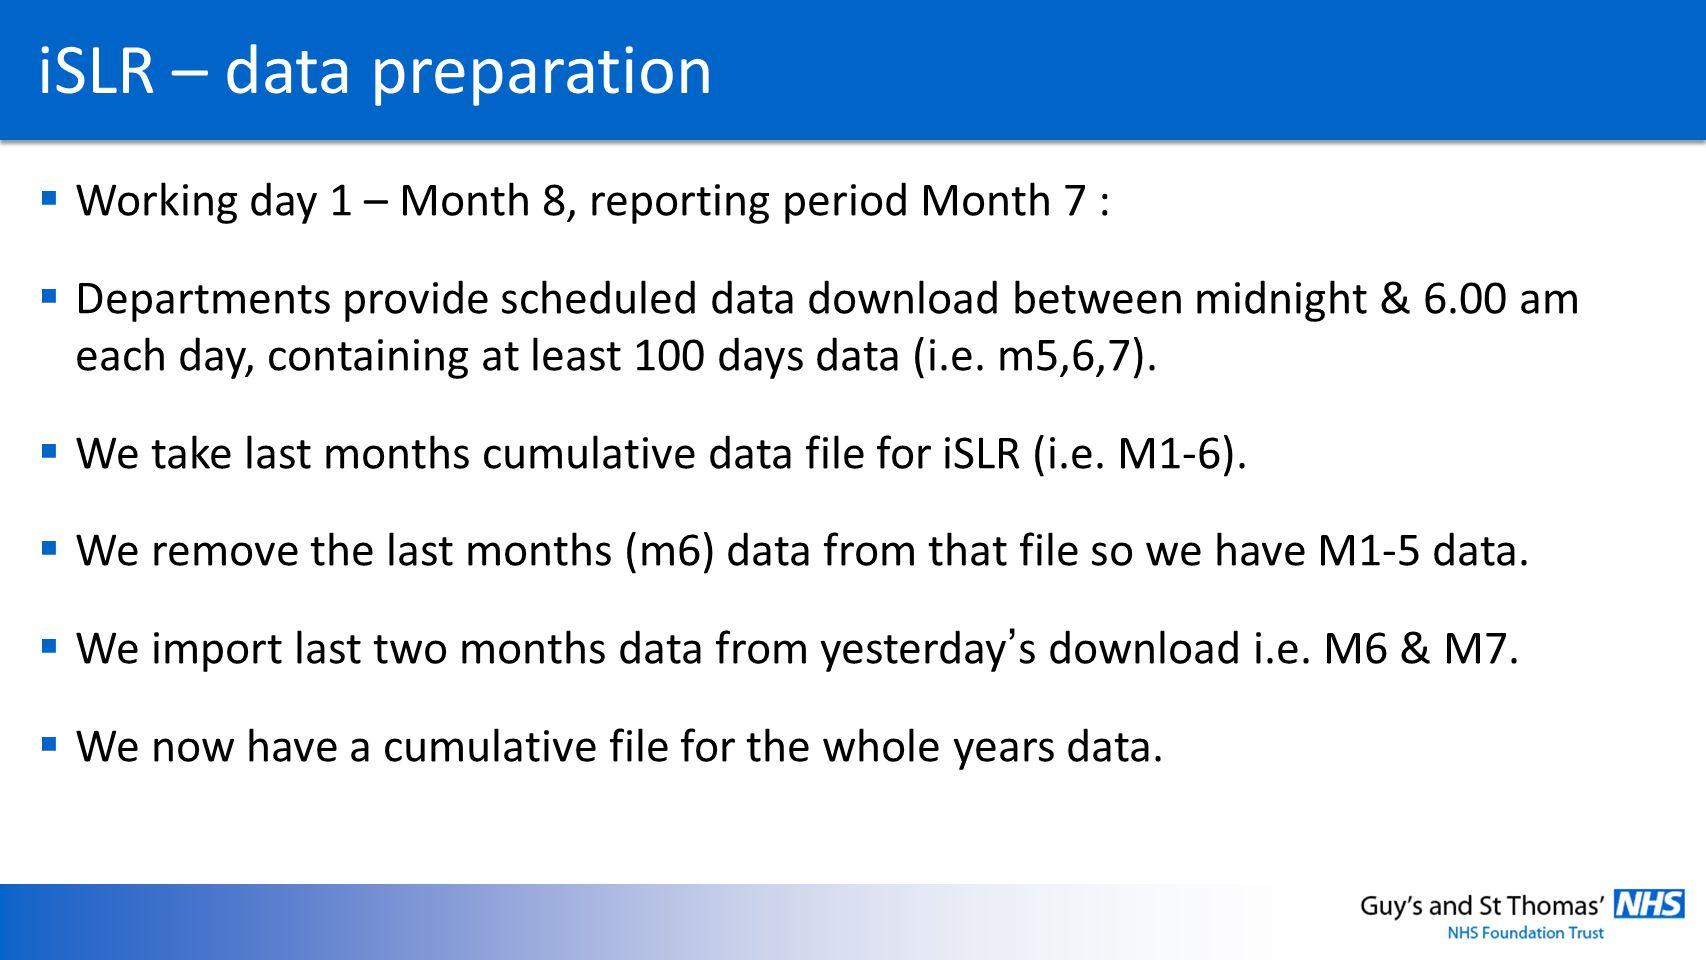 iSLR – data preparation